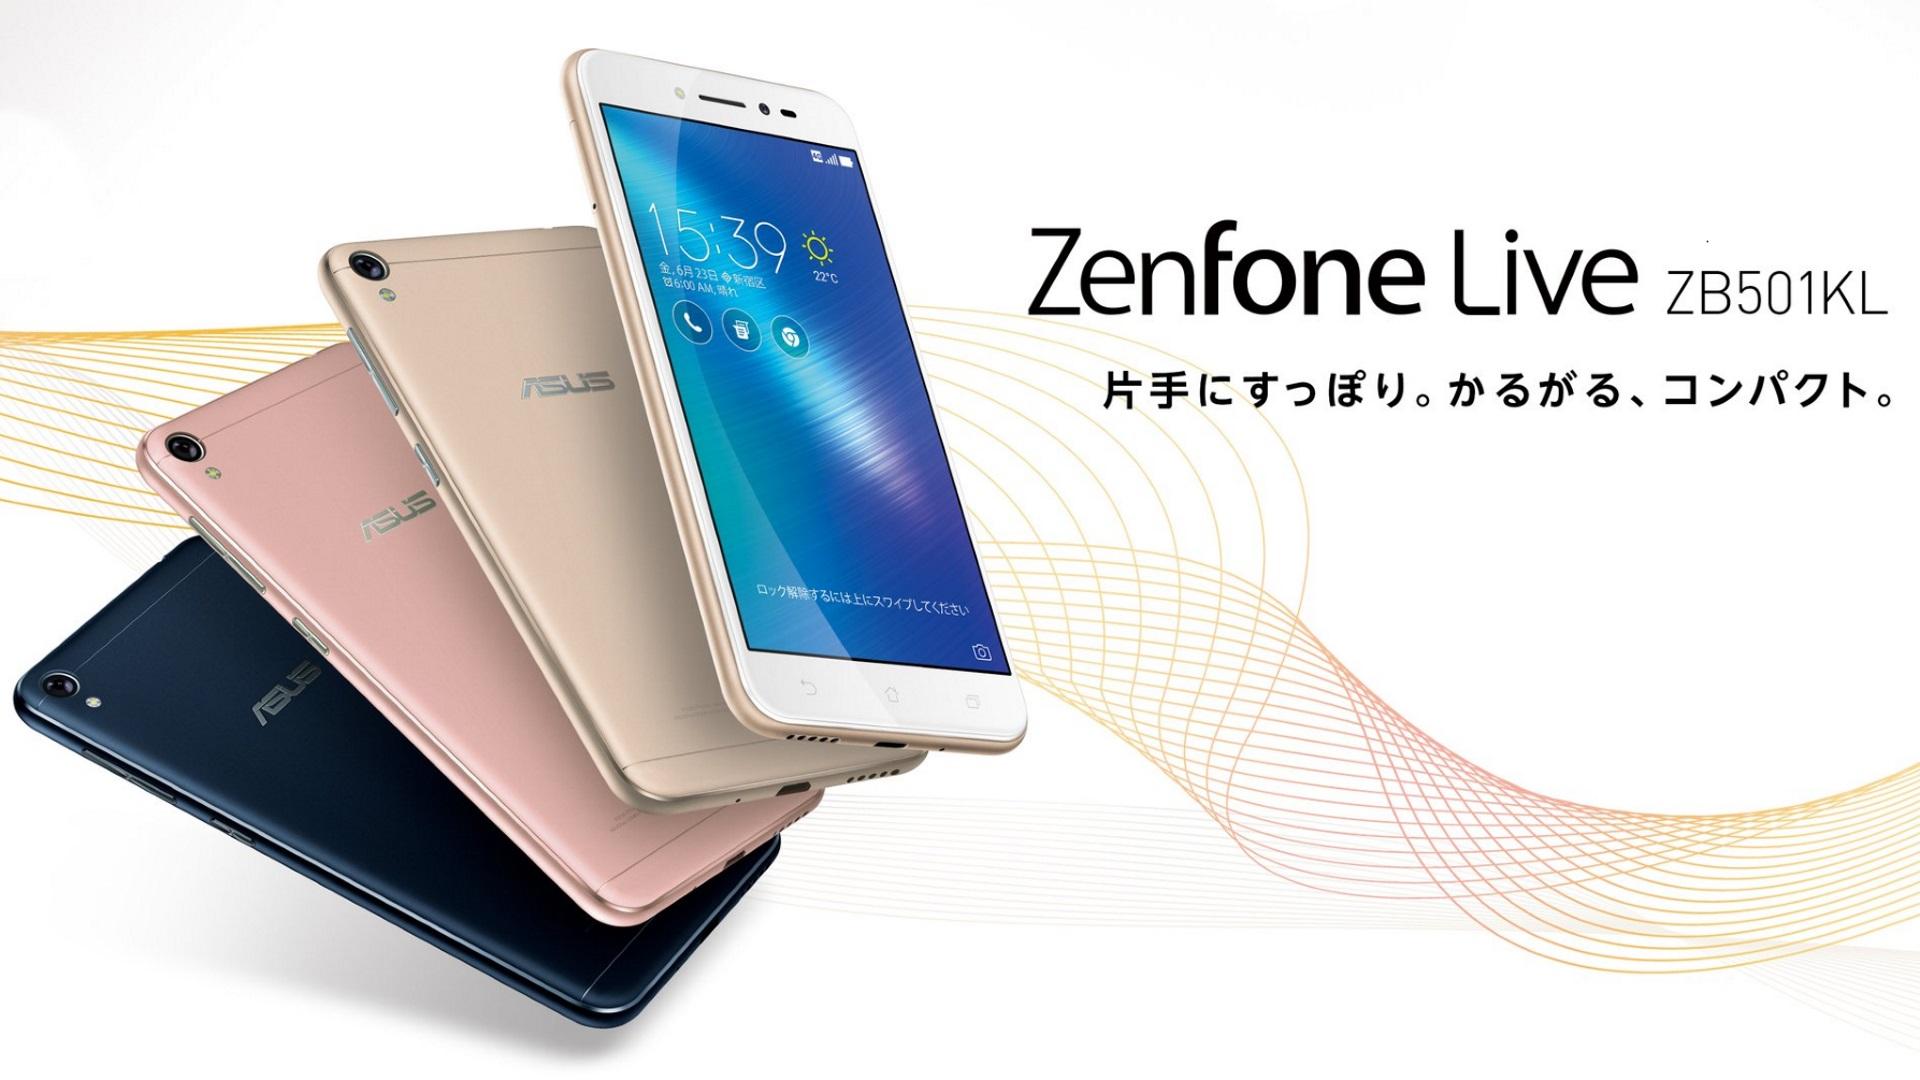 「ZenFone Live(ZB501KL)」国内発表、19,800円で7月14日発売